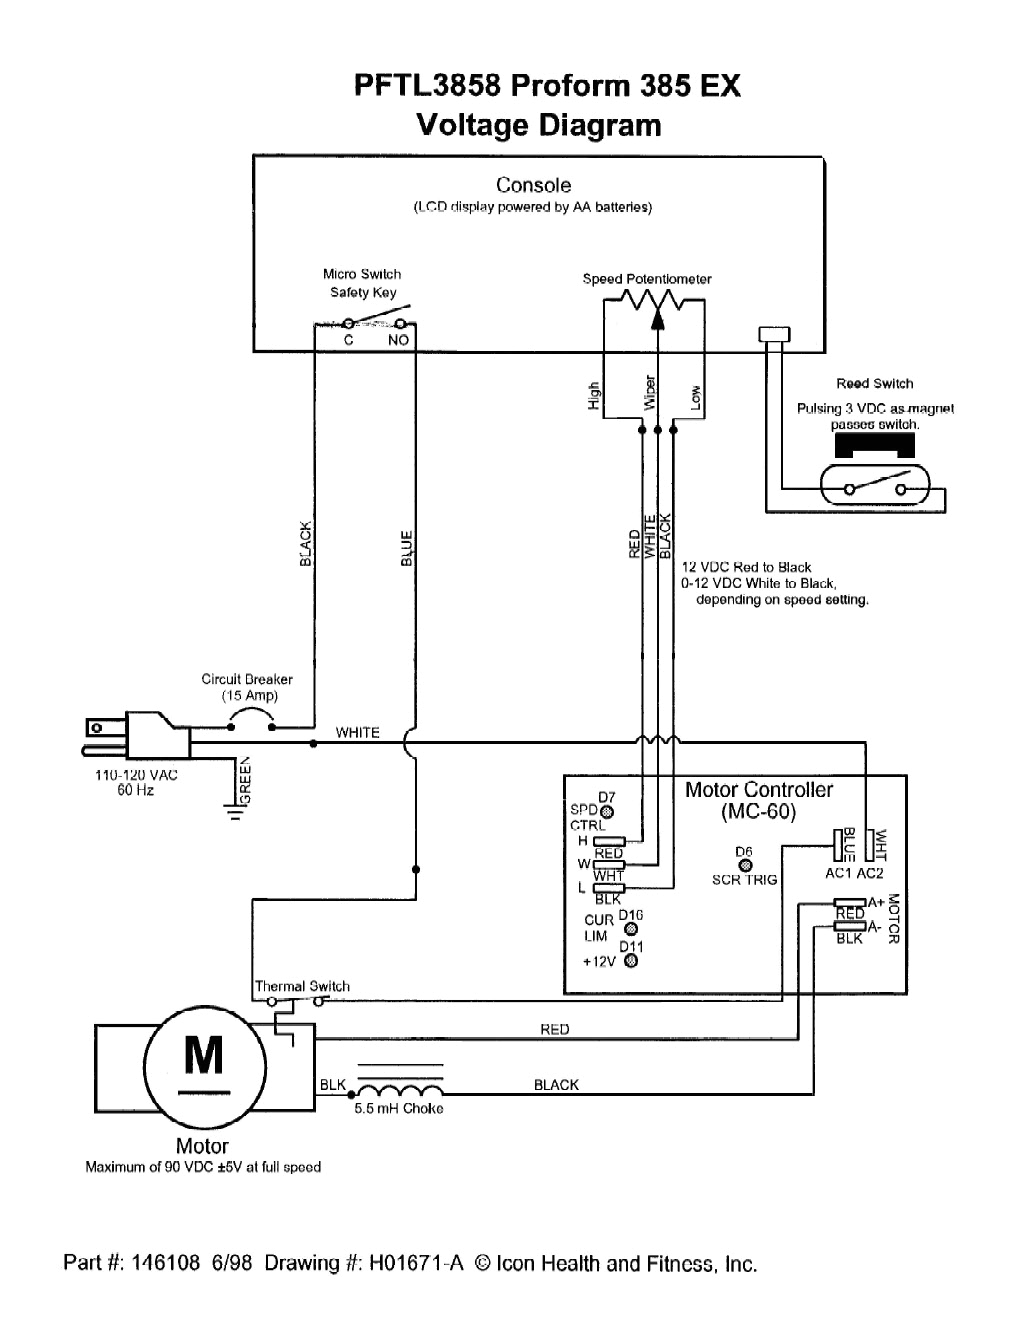 proform mc60 voltage diagram schematic jpg